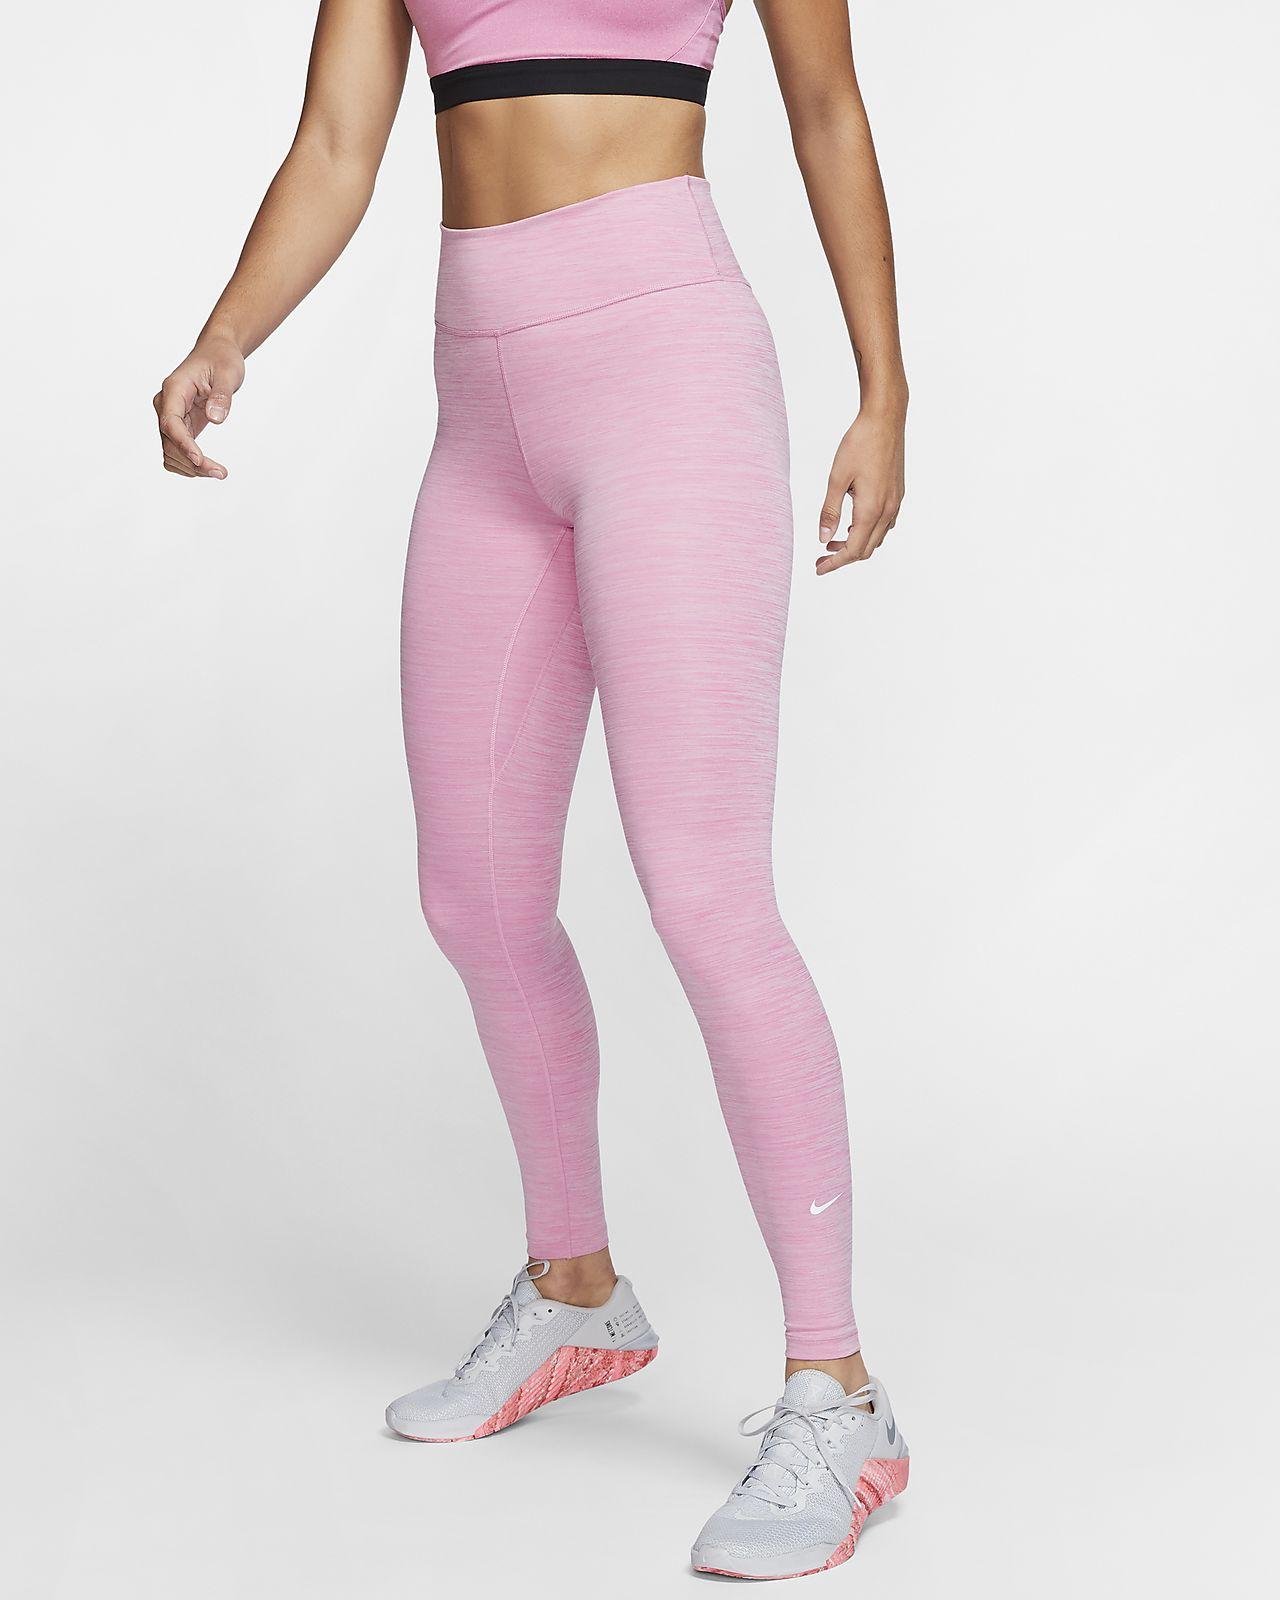 Legginsy damskie Nike One